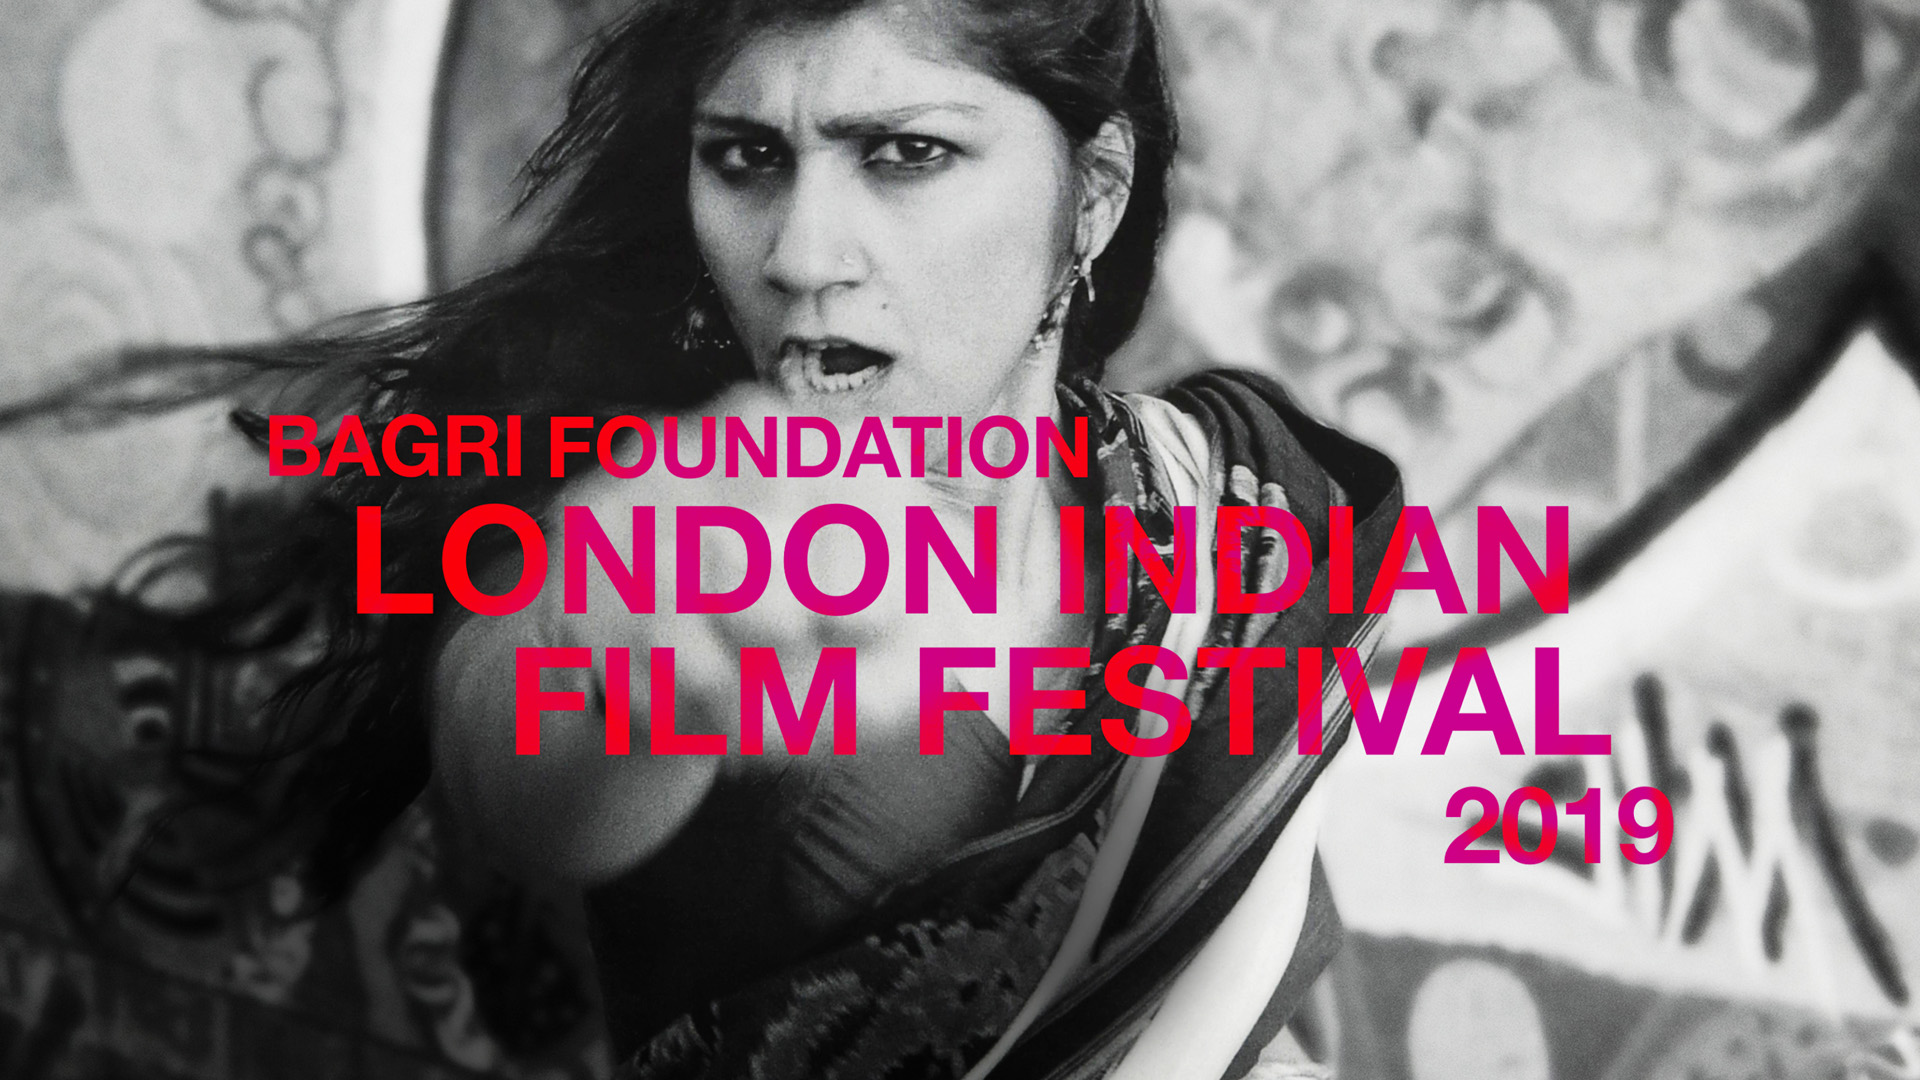 london Indian film festival 2019 Trailer